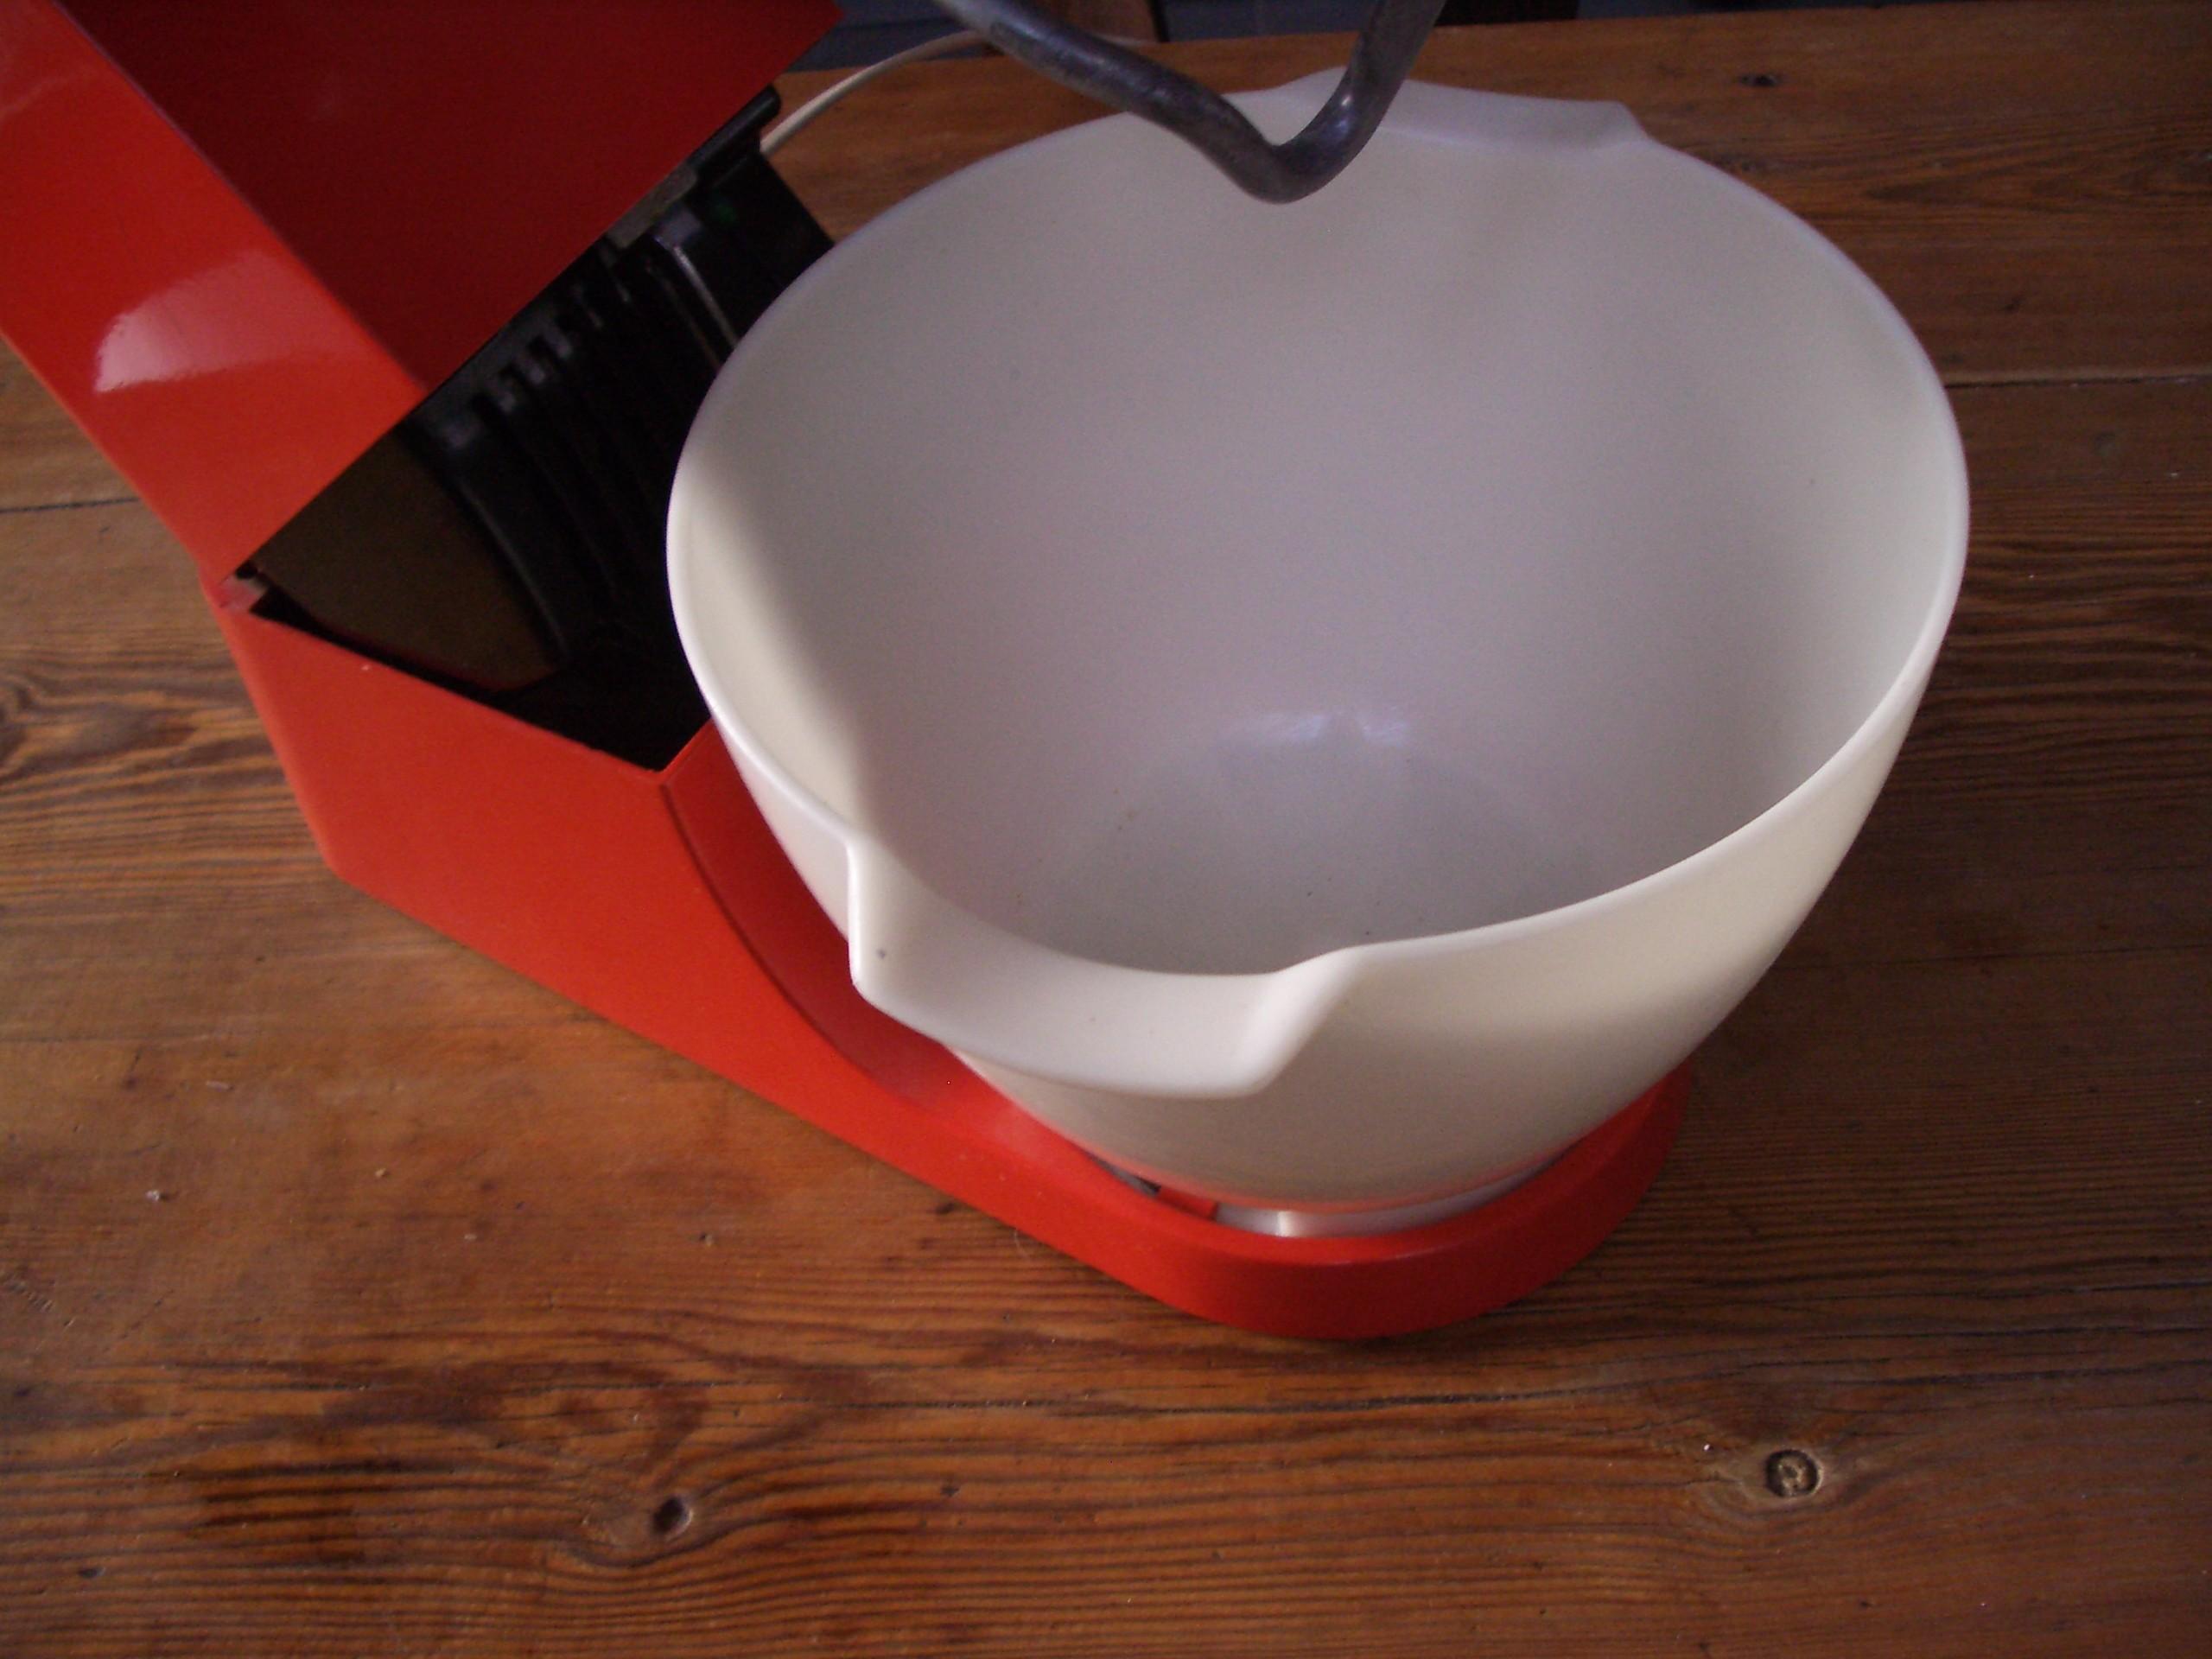 Robot cuisine multifiction petrin kenwood chef a 901 orange vintage mixeur ebay - Robot de cuisine petrin ...